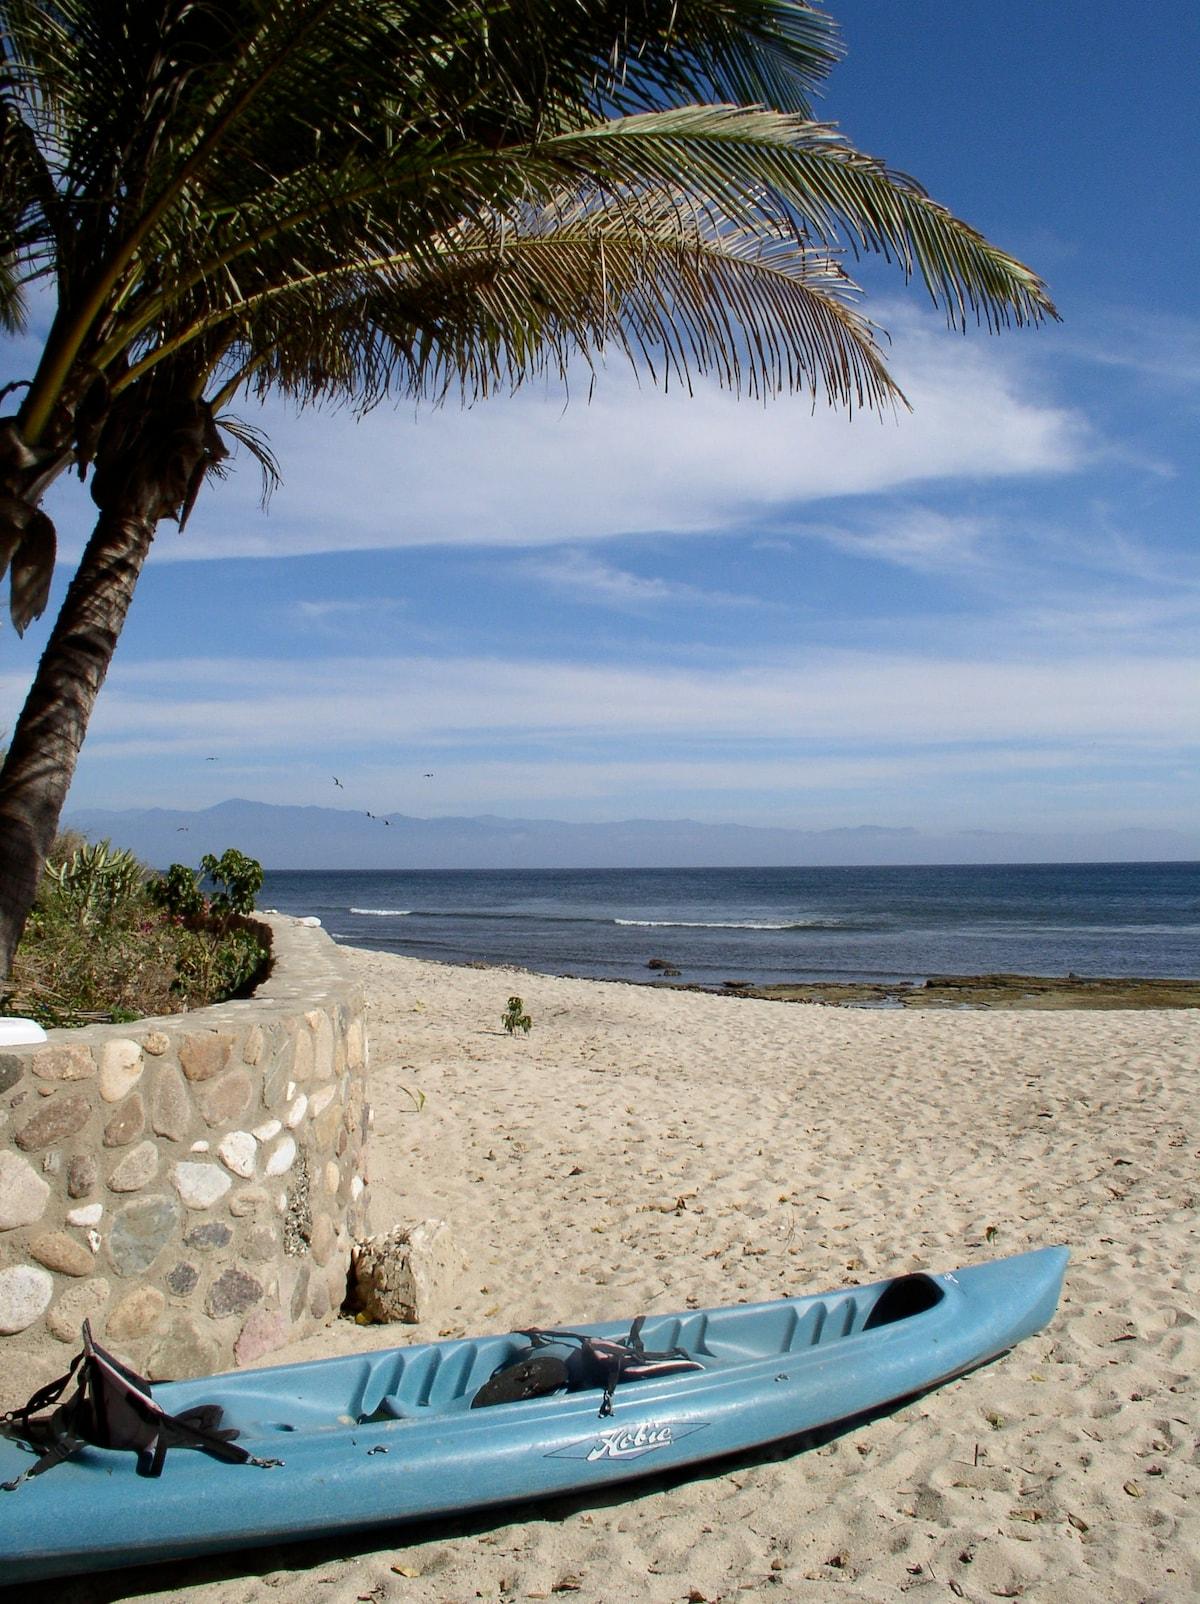 Beach Patio and Kayak